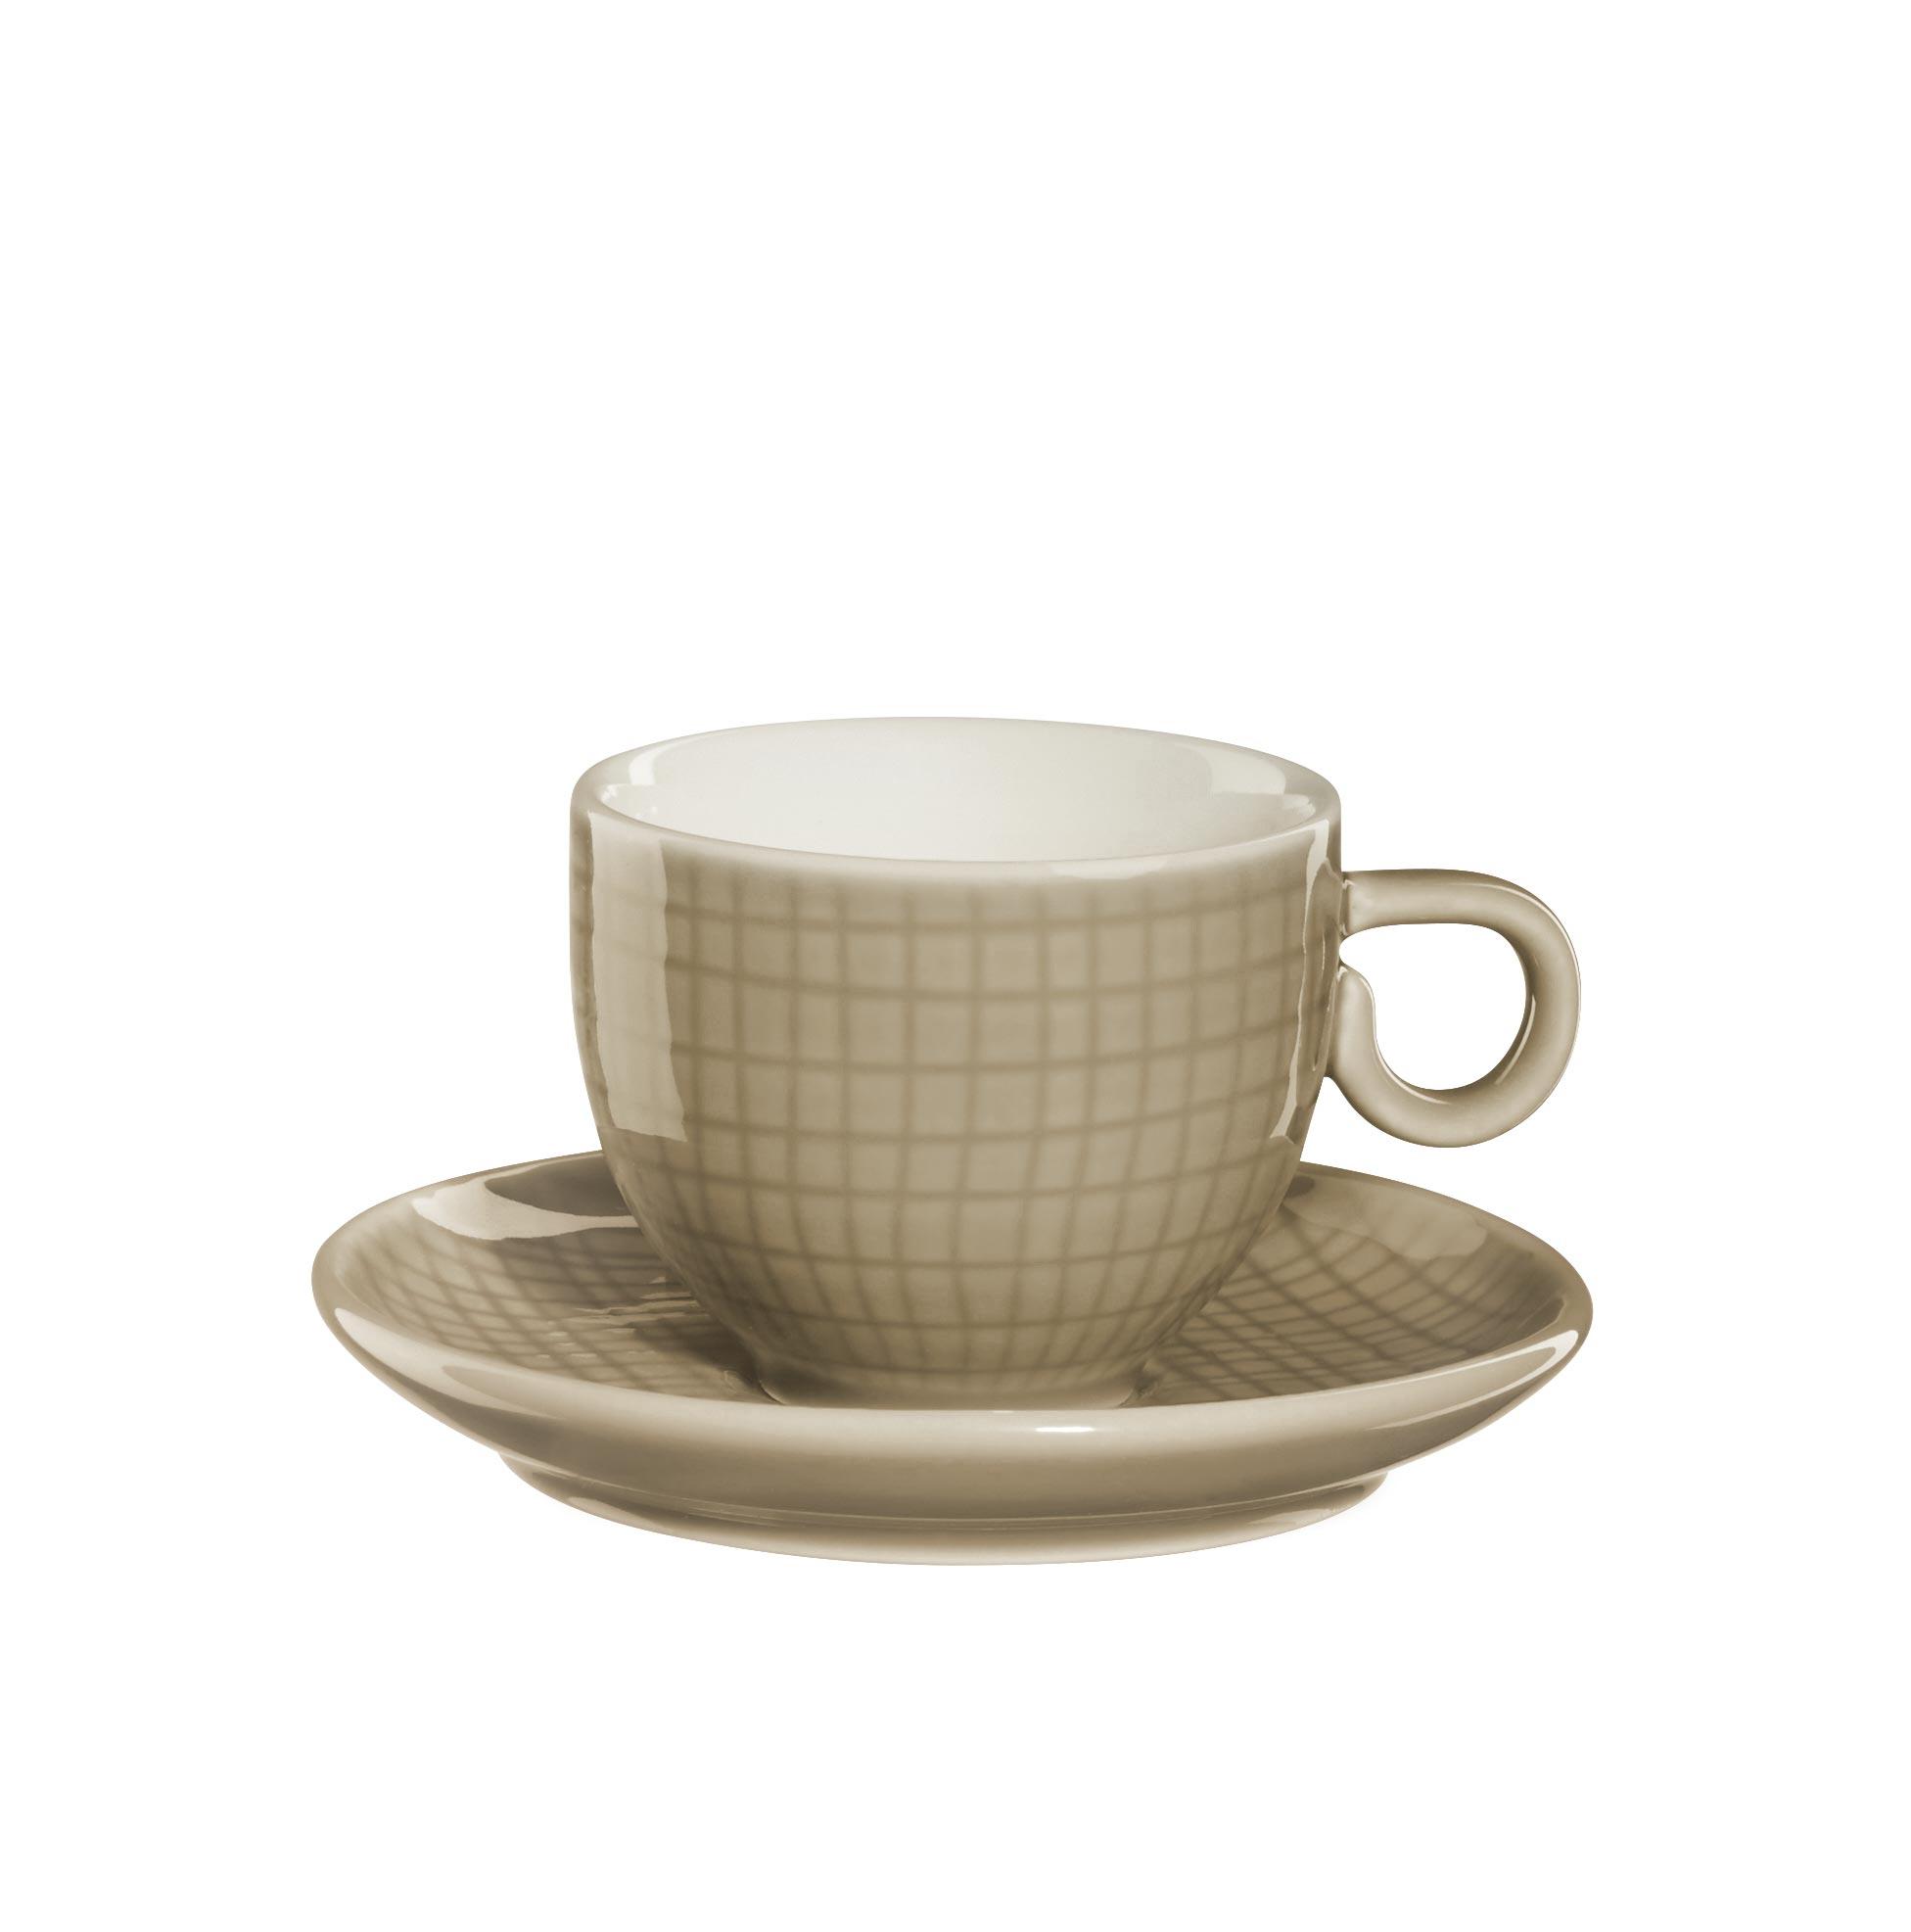 espressotasse mit unterteller home by asa die asa selection wohnwelten. Black Bedroom Furniture Sets. Home Design Ideas